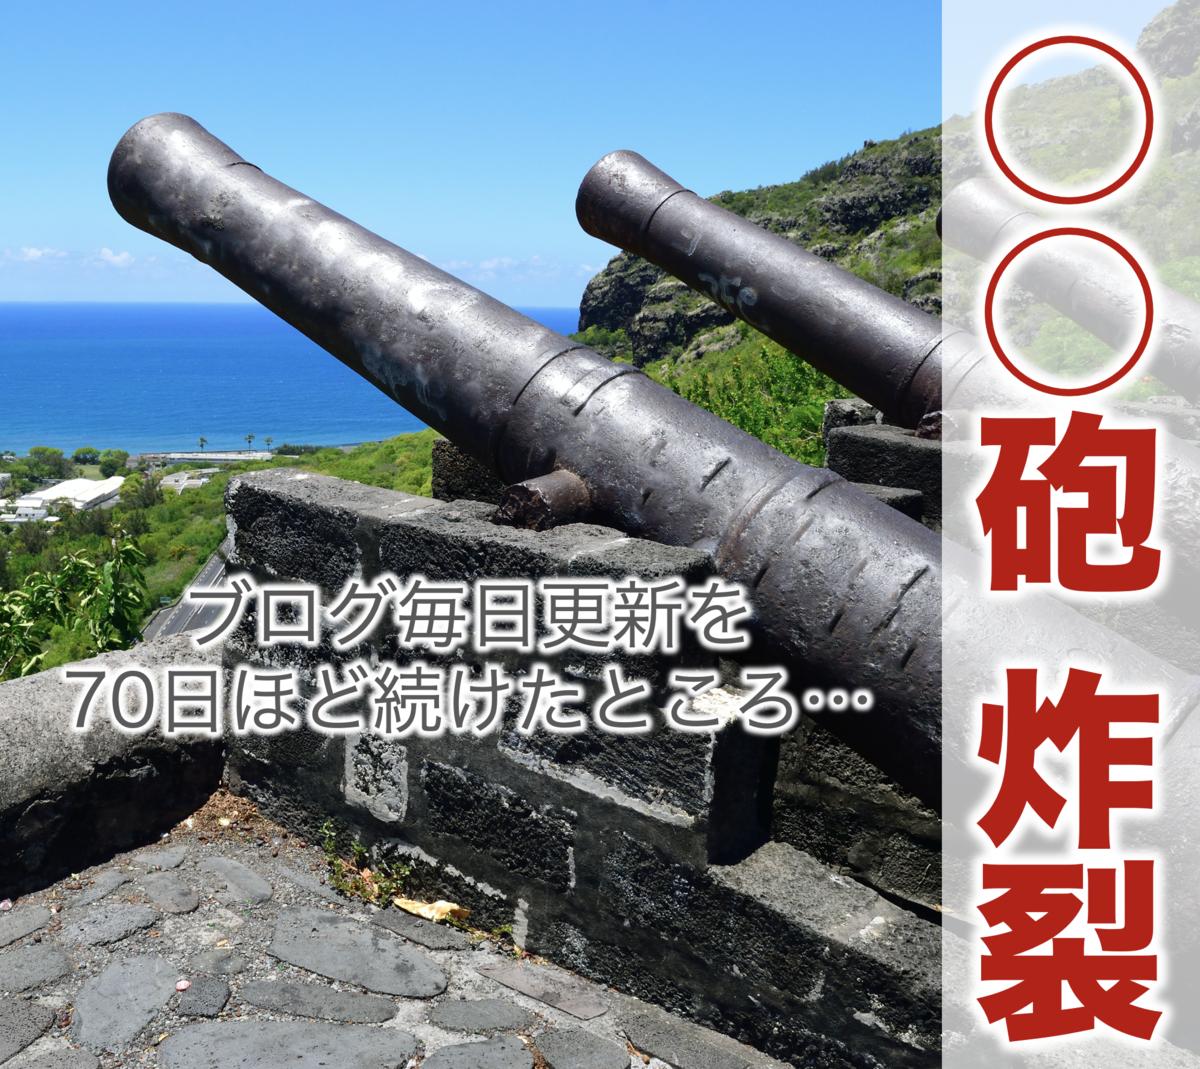 f:id:presen-sen-nin:20200511203433p:plain